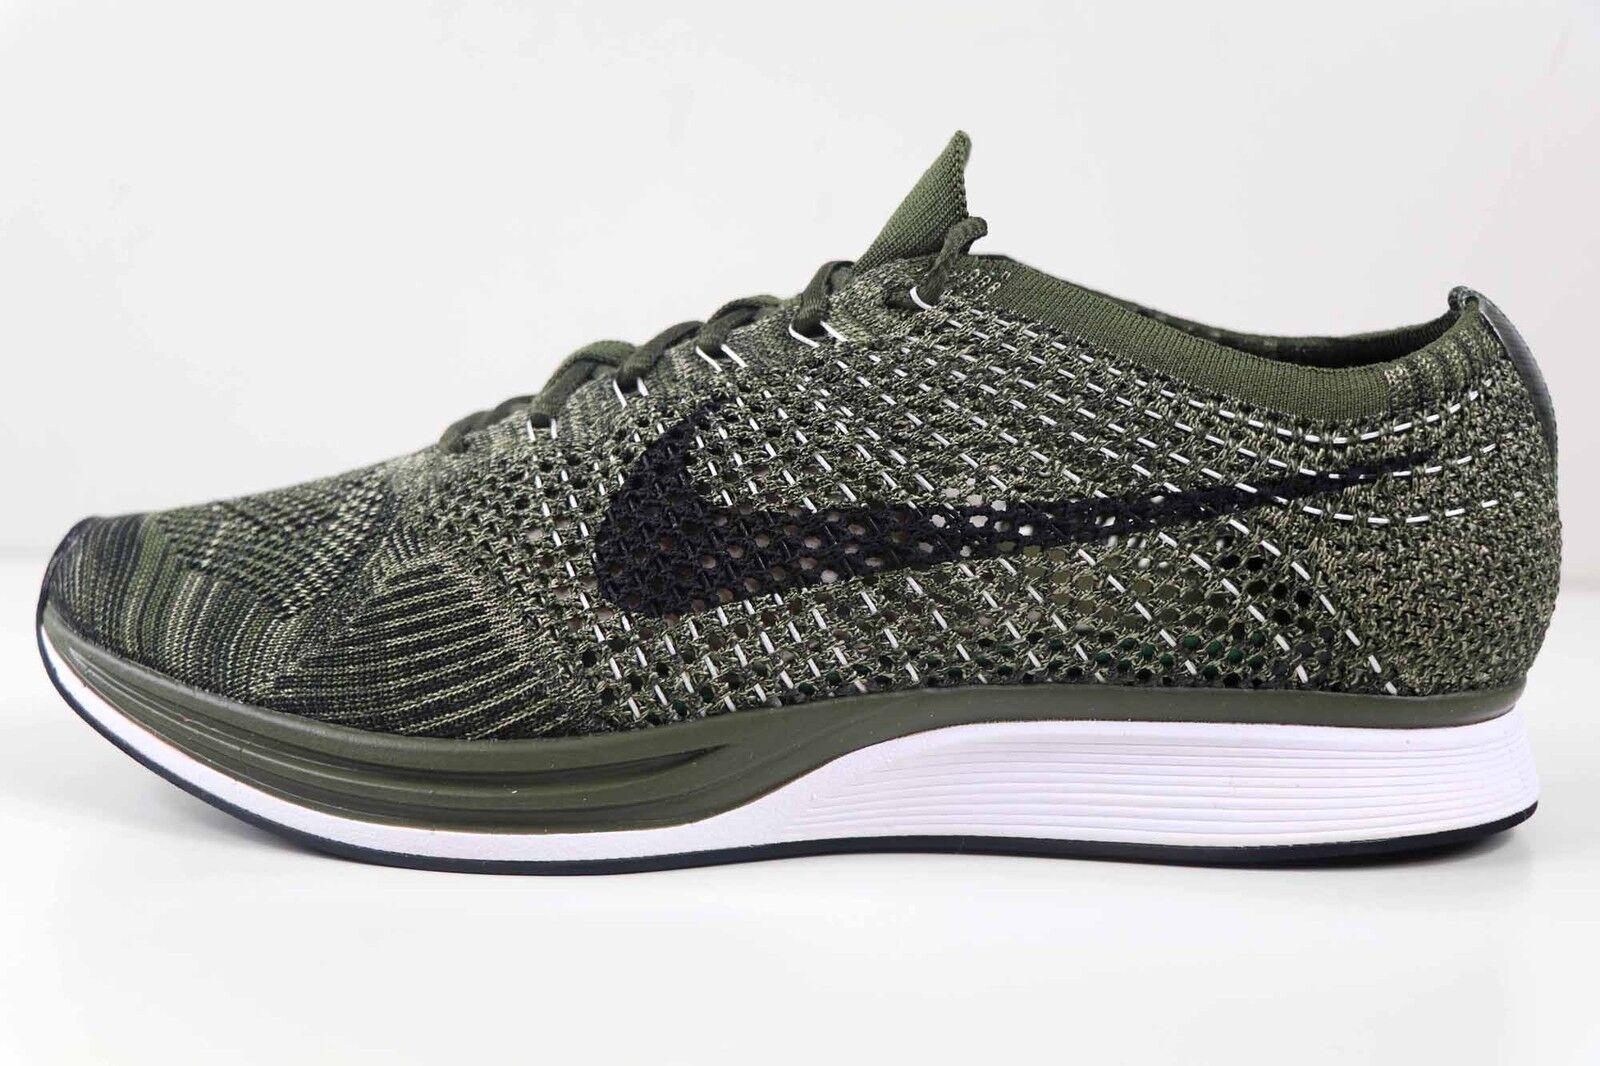 Nike Flyknit Racer Rough Green Black 8862713 300 Size 7 Womens 8.5 New in Box